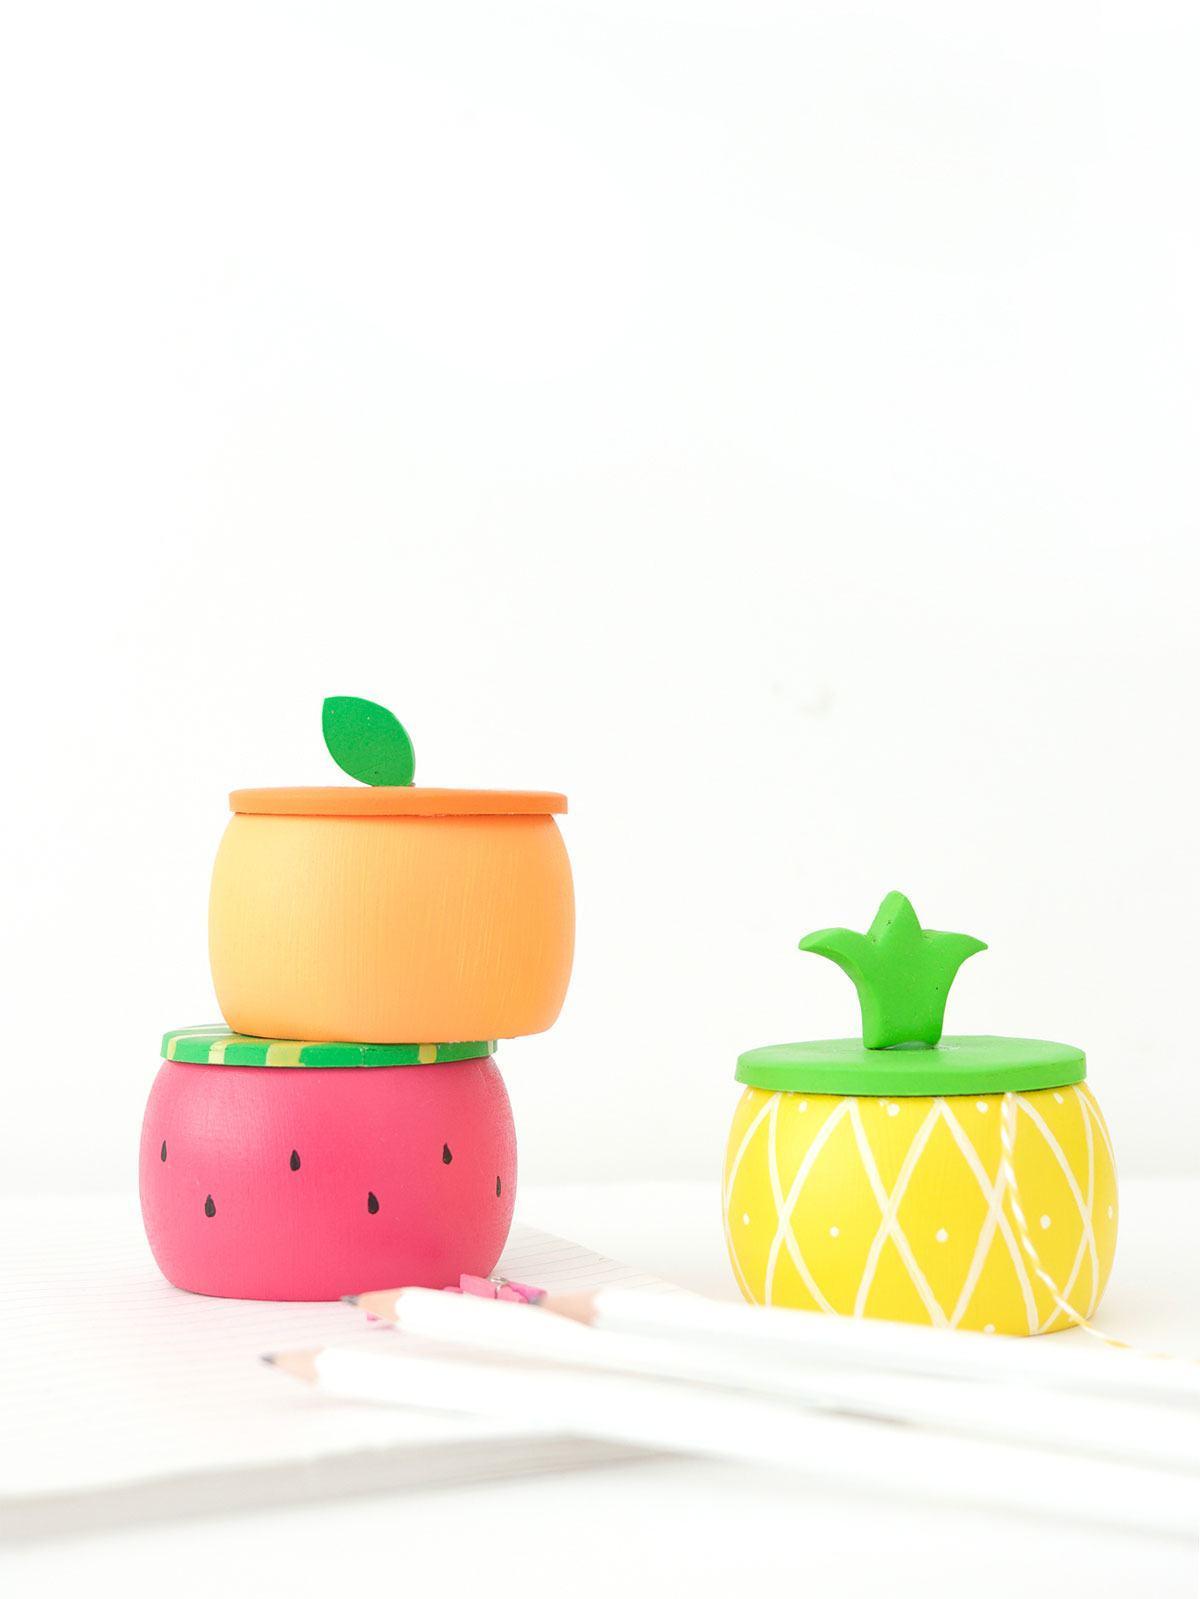 Potes coloridos de madeira para guardar objetos